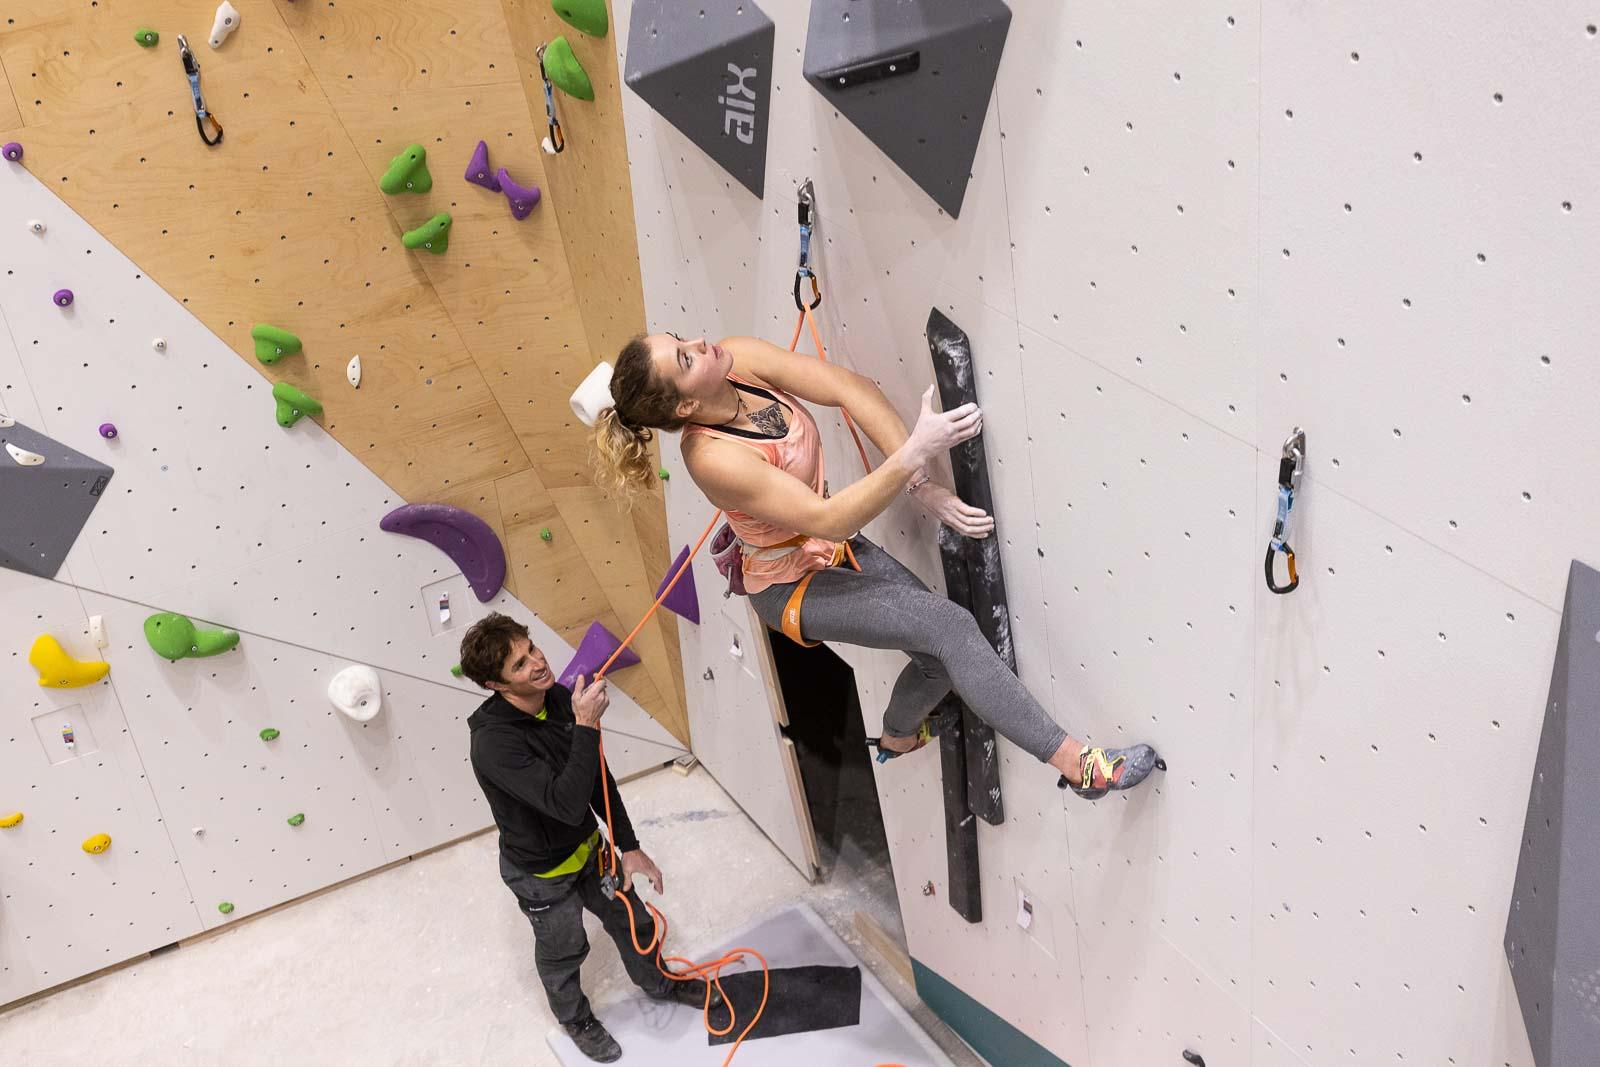 Voies d'escalade à Climb Up Lille centre